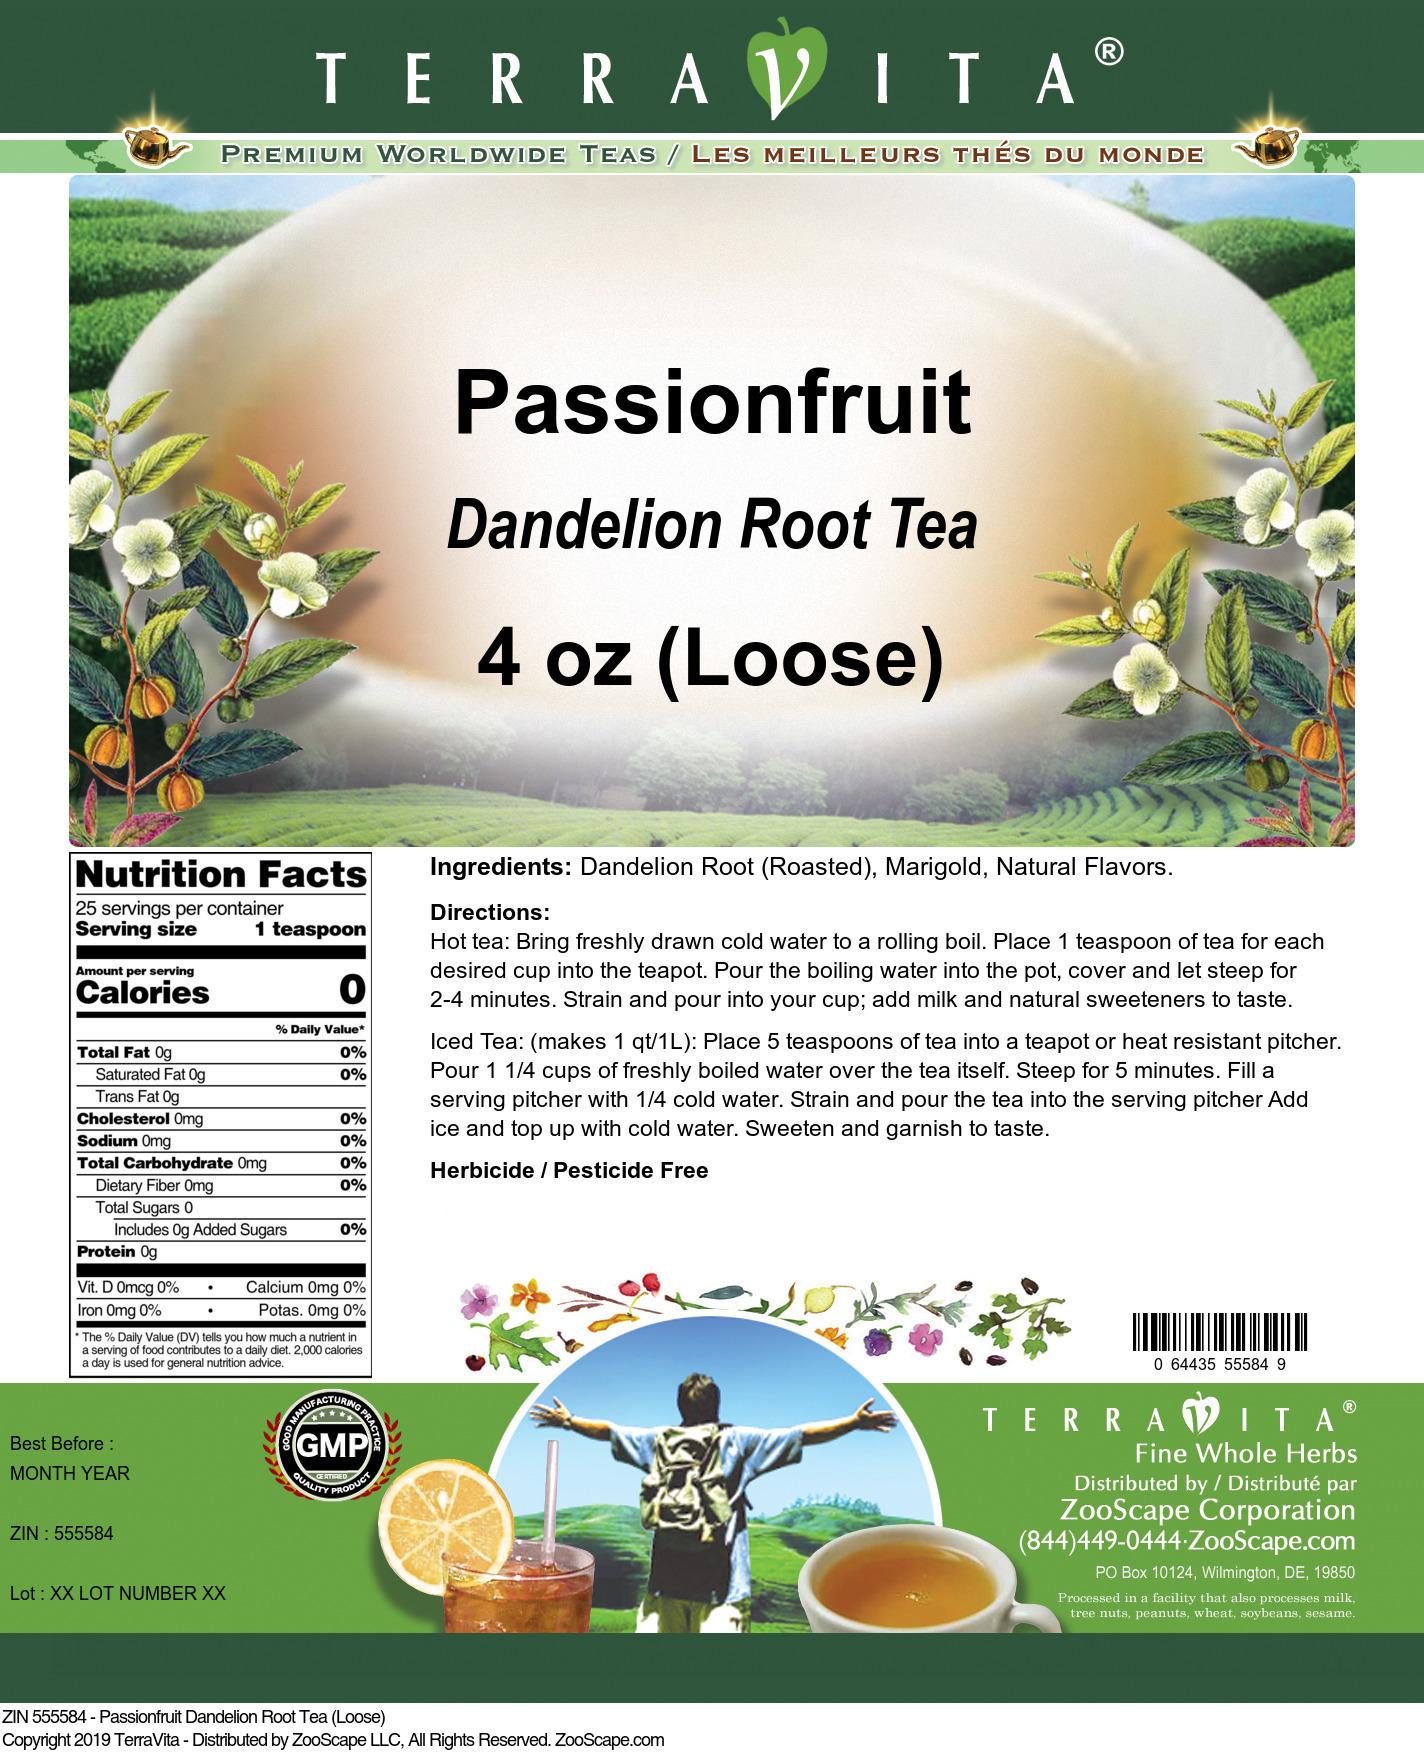 Passionfruit Dandelion Root Tea (Loose)